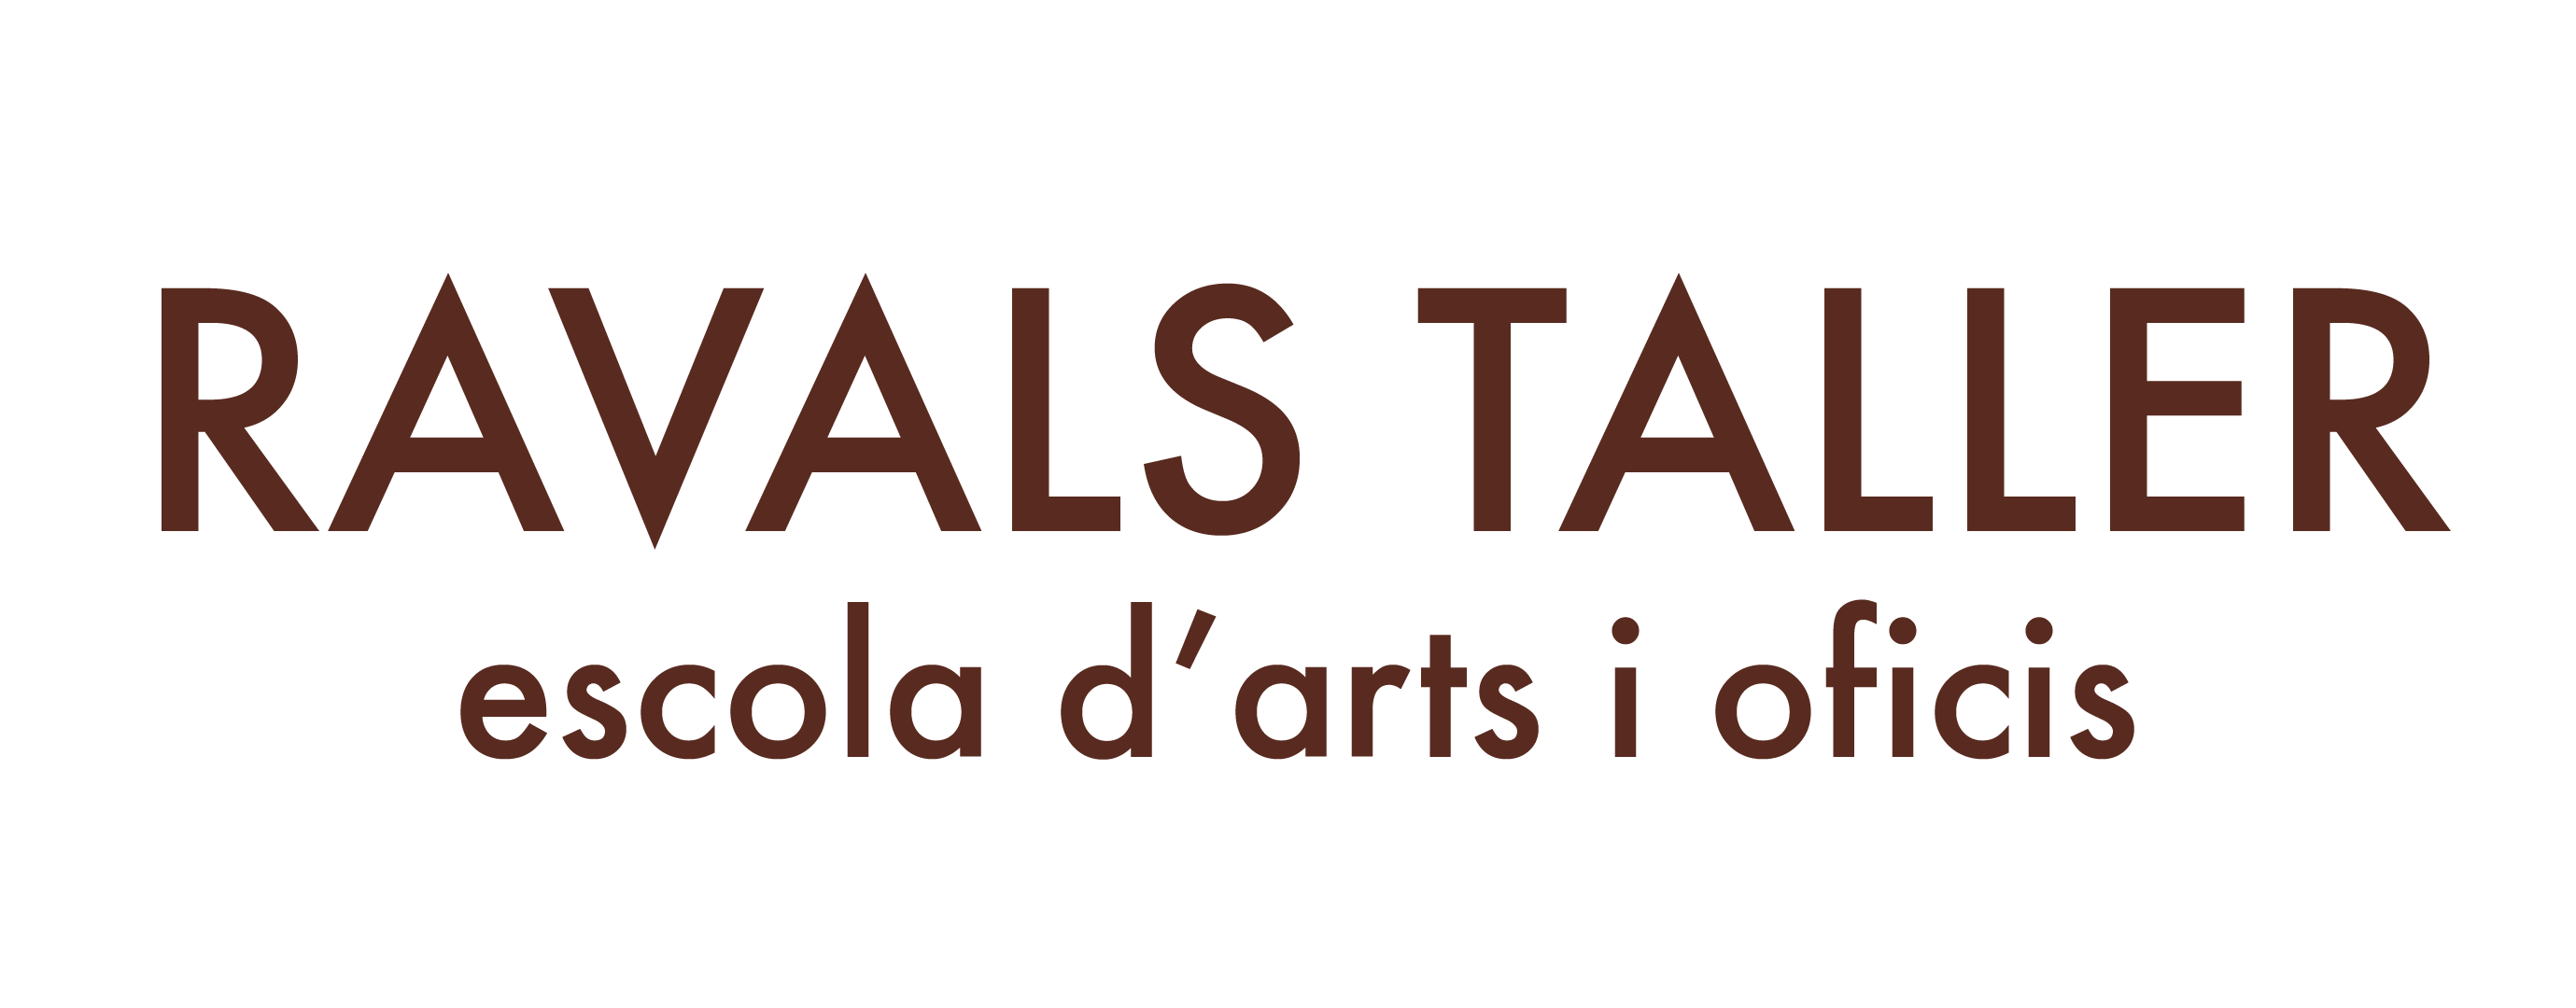 Ravals Taller